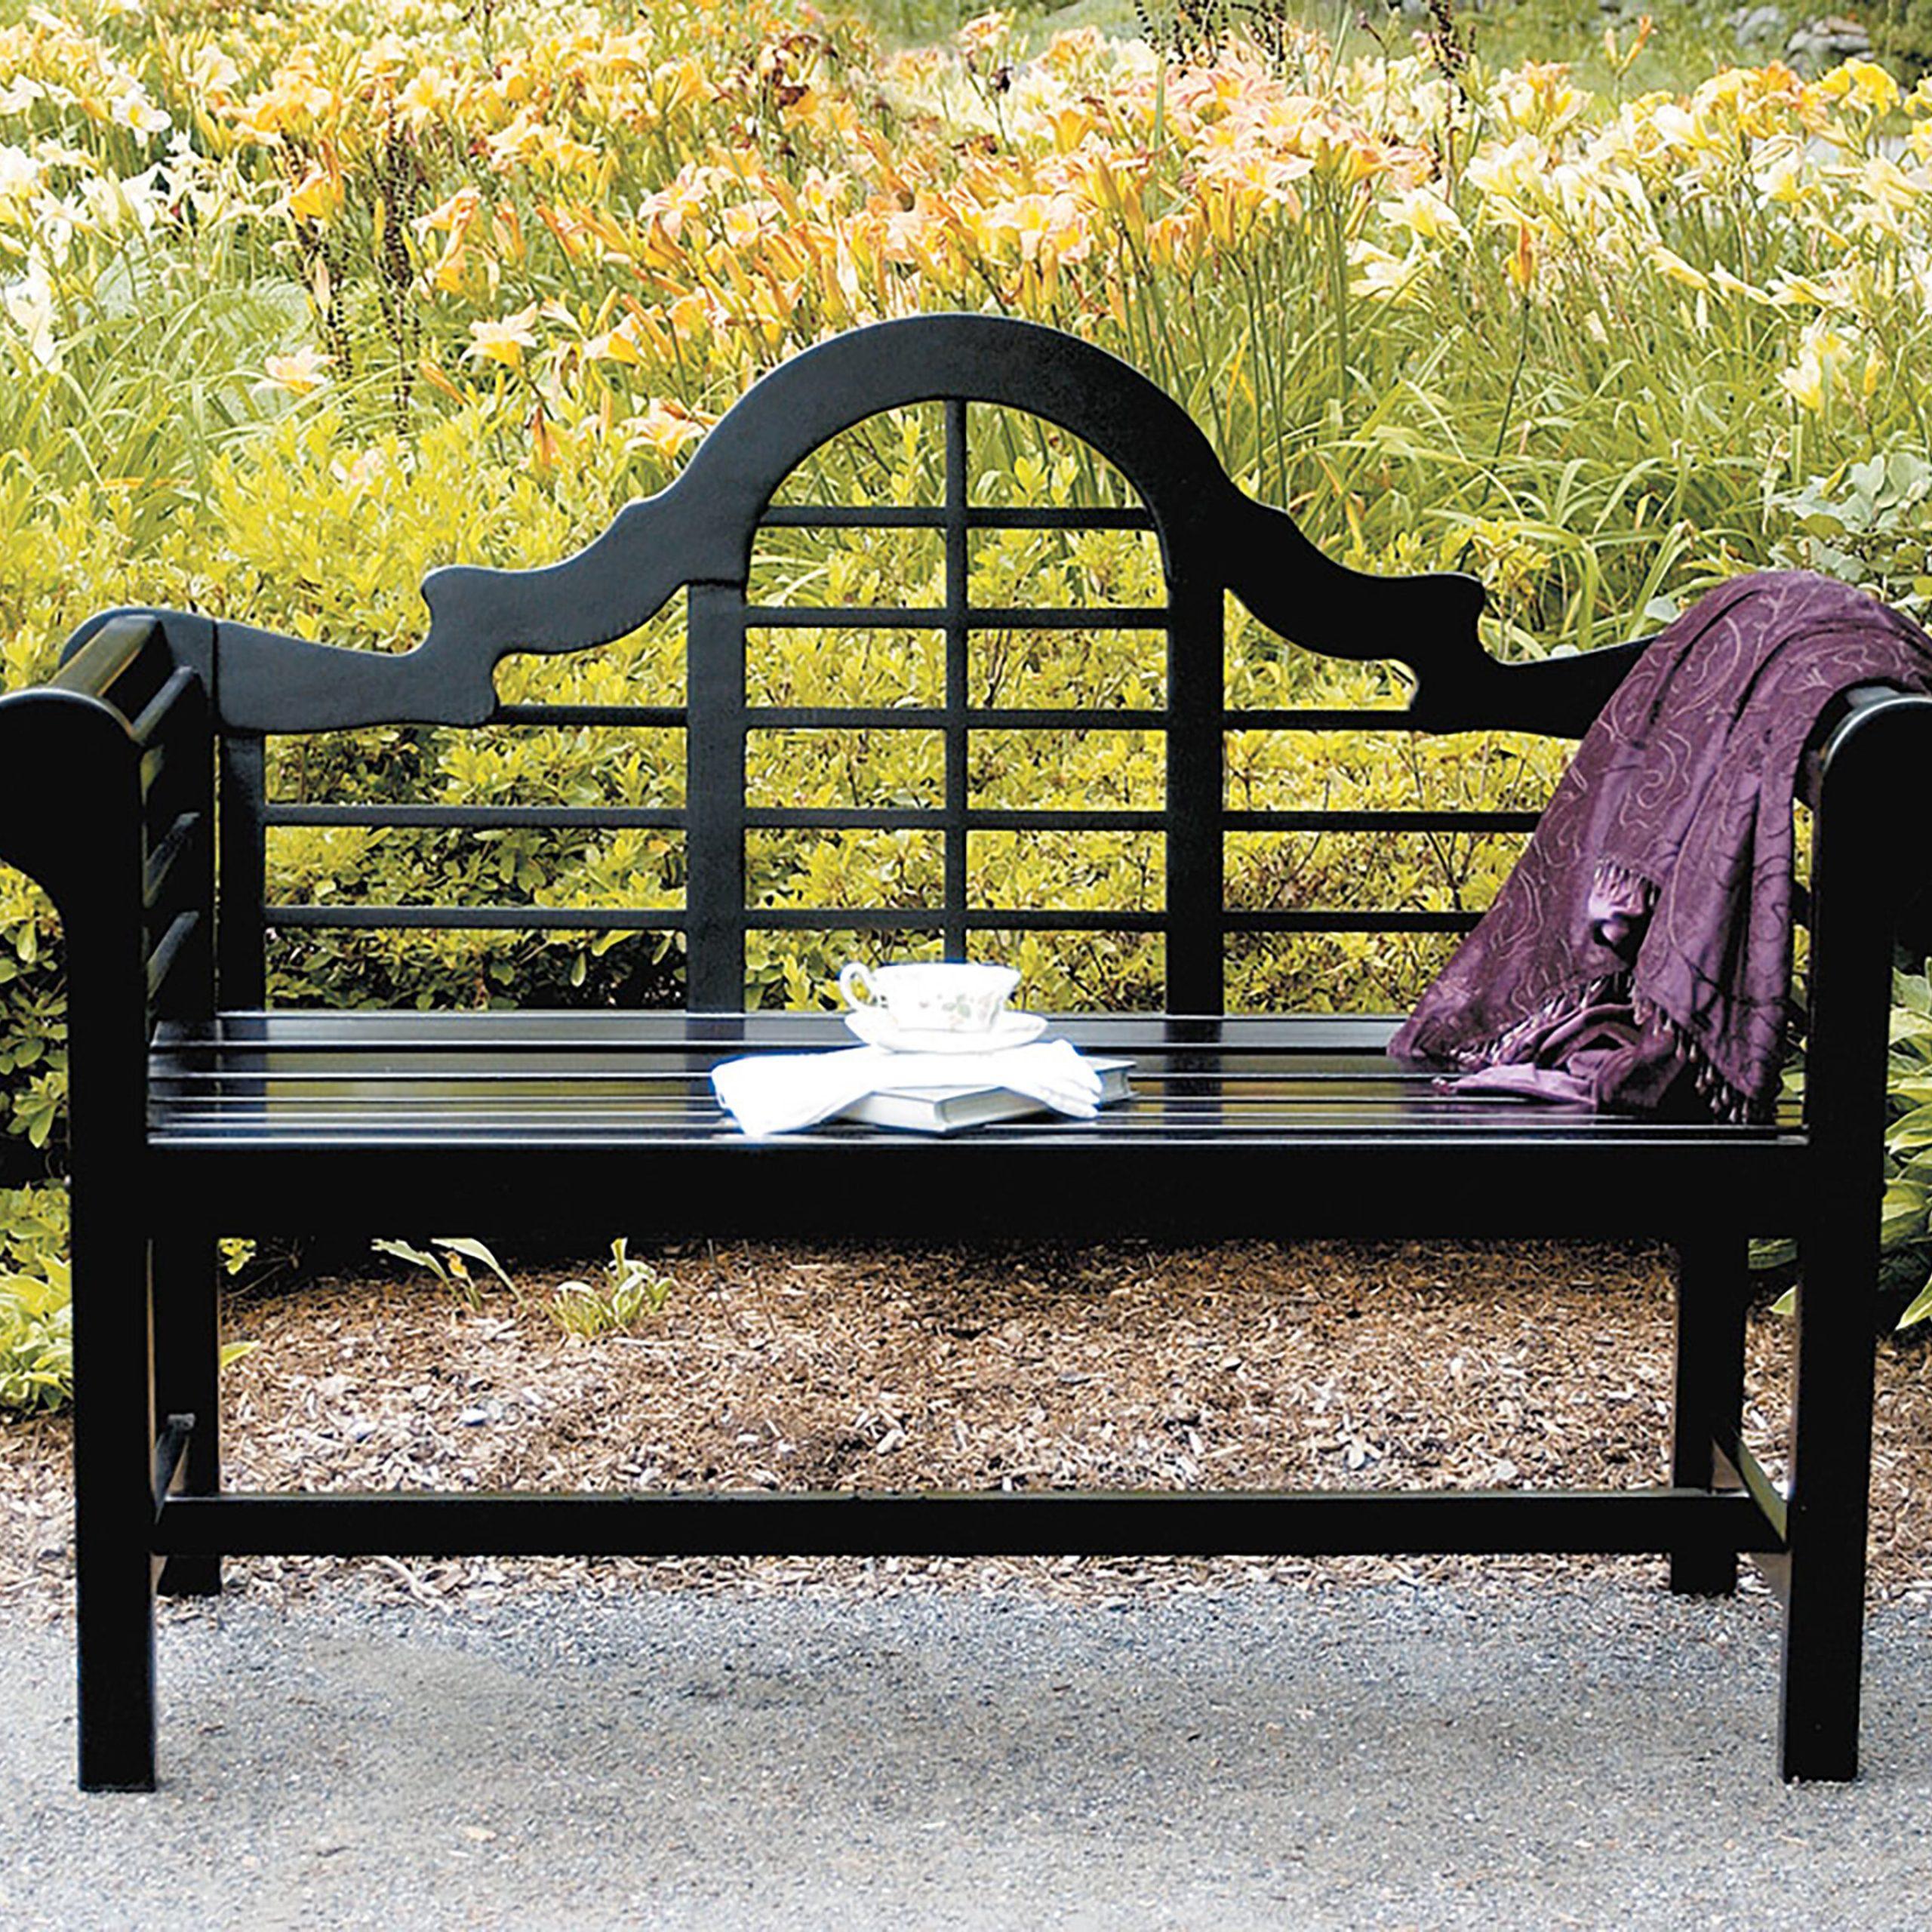 Garden Outdoor Benches You'Ll Love In 2020 | Wayfair Throughout Pauls Steel Garden Benches (View 12 of 25)